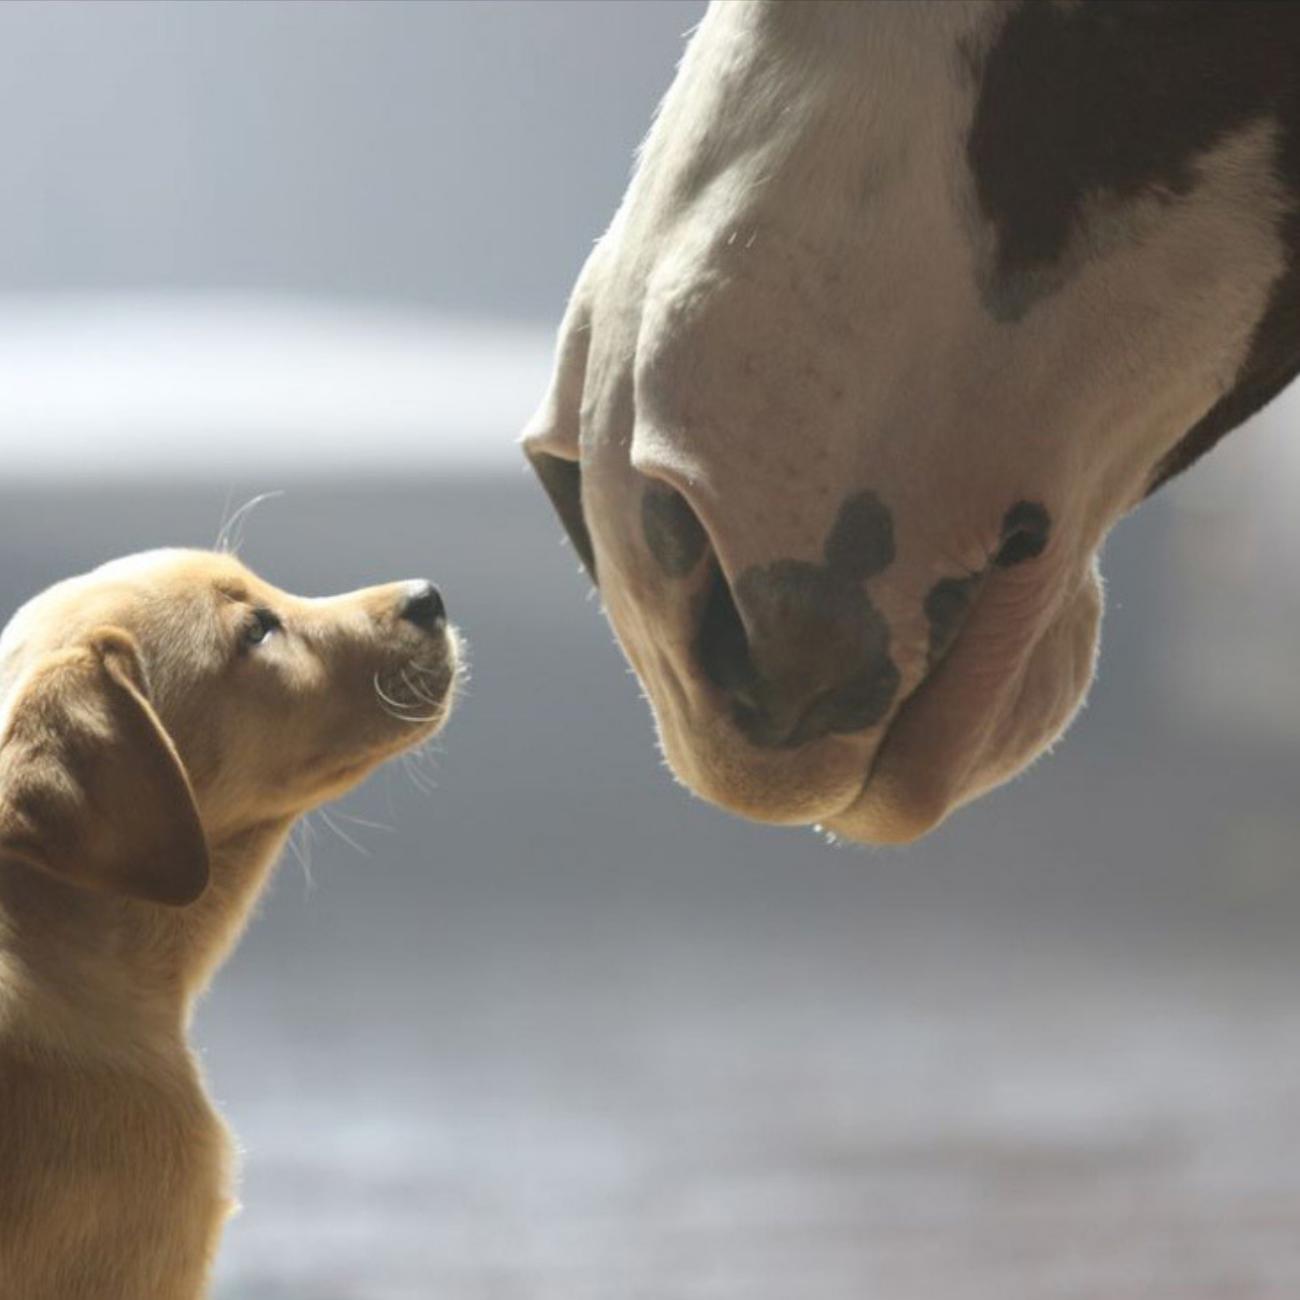 What Makes Super Bowl Ads Super?